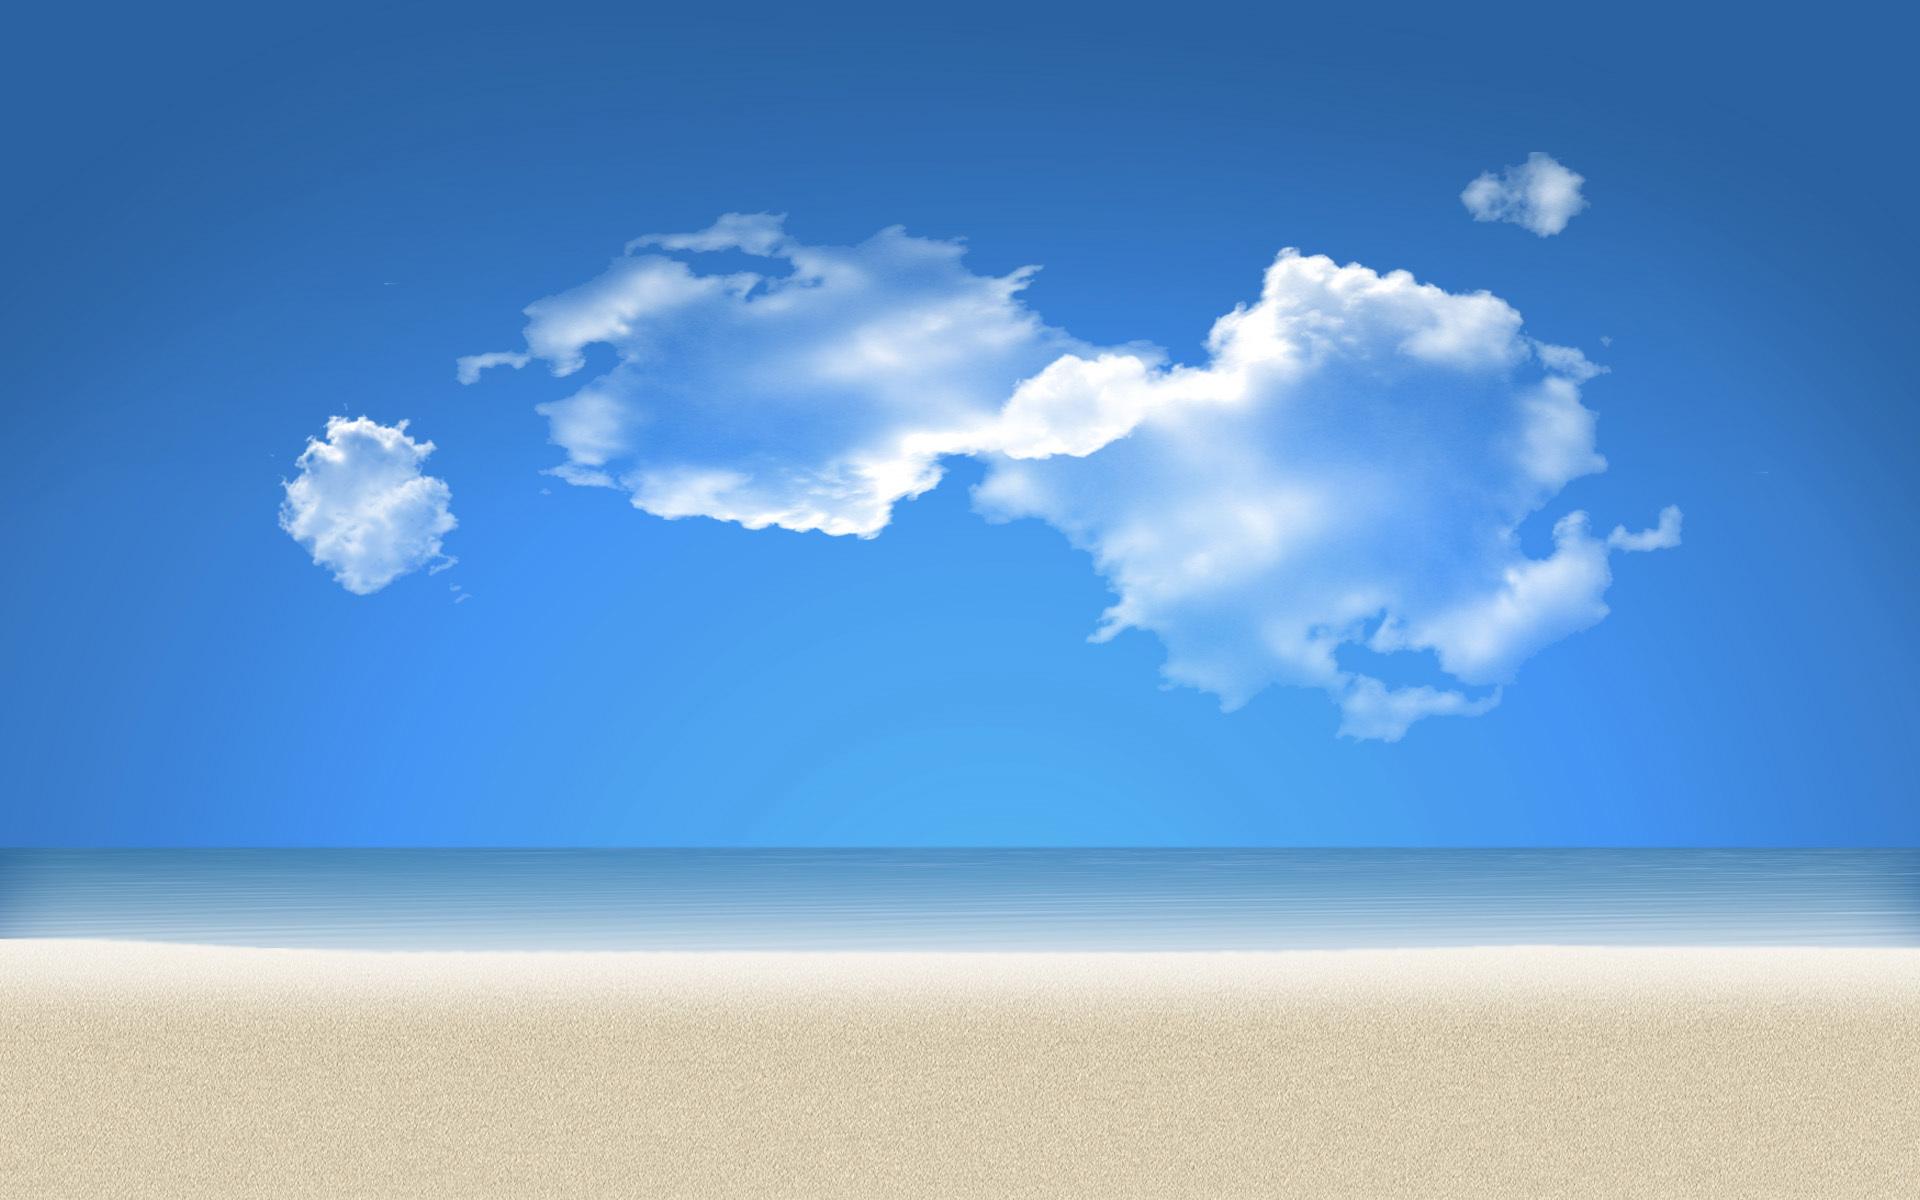 природа песок море горизонт небо облака  № 2577468 бесплатно